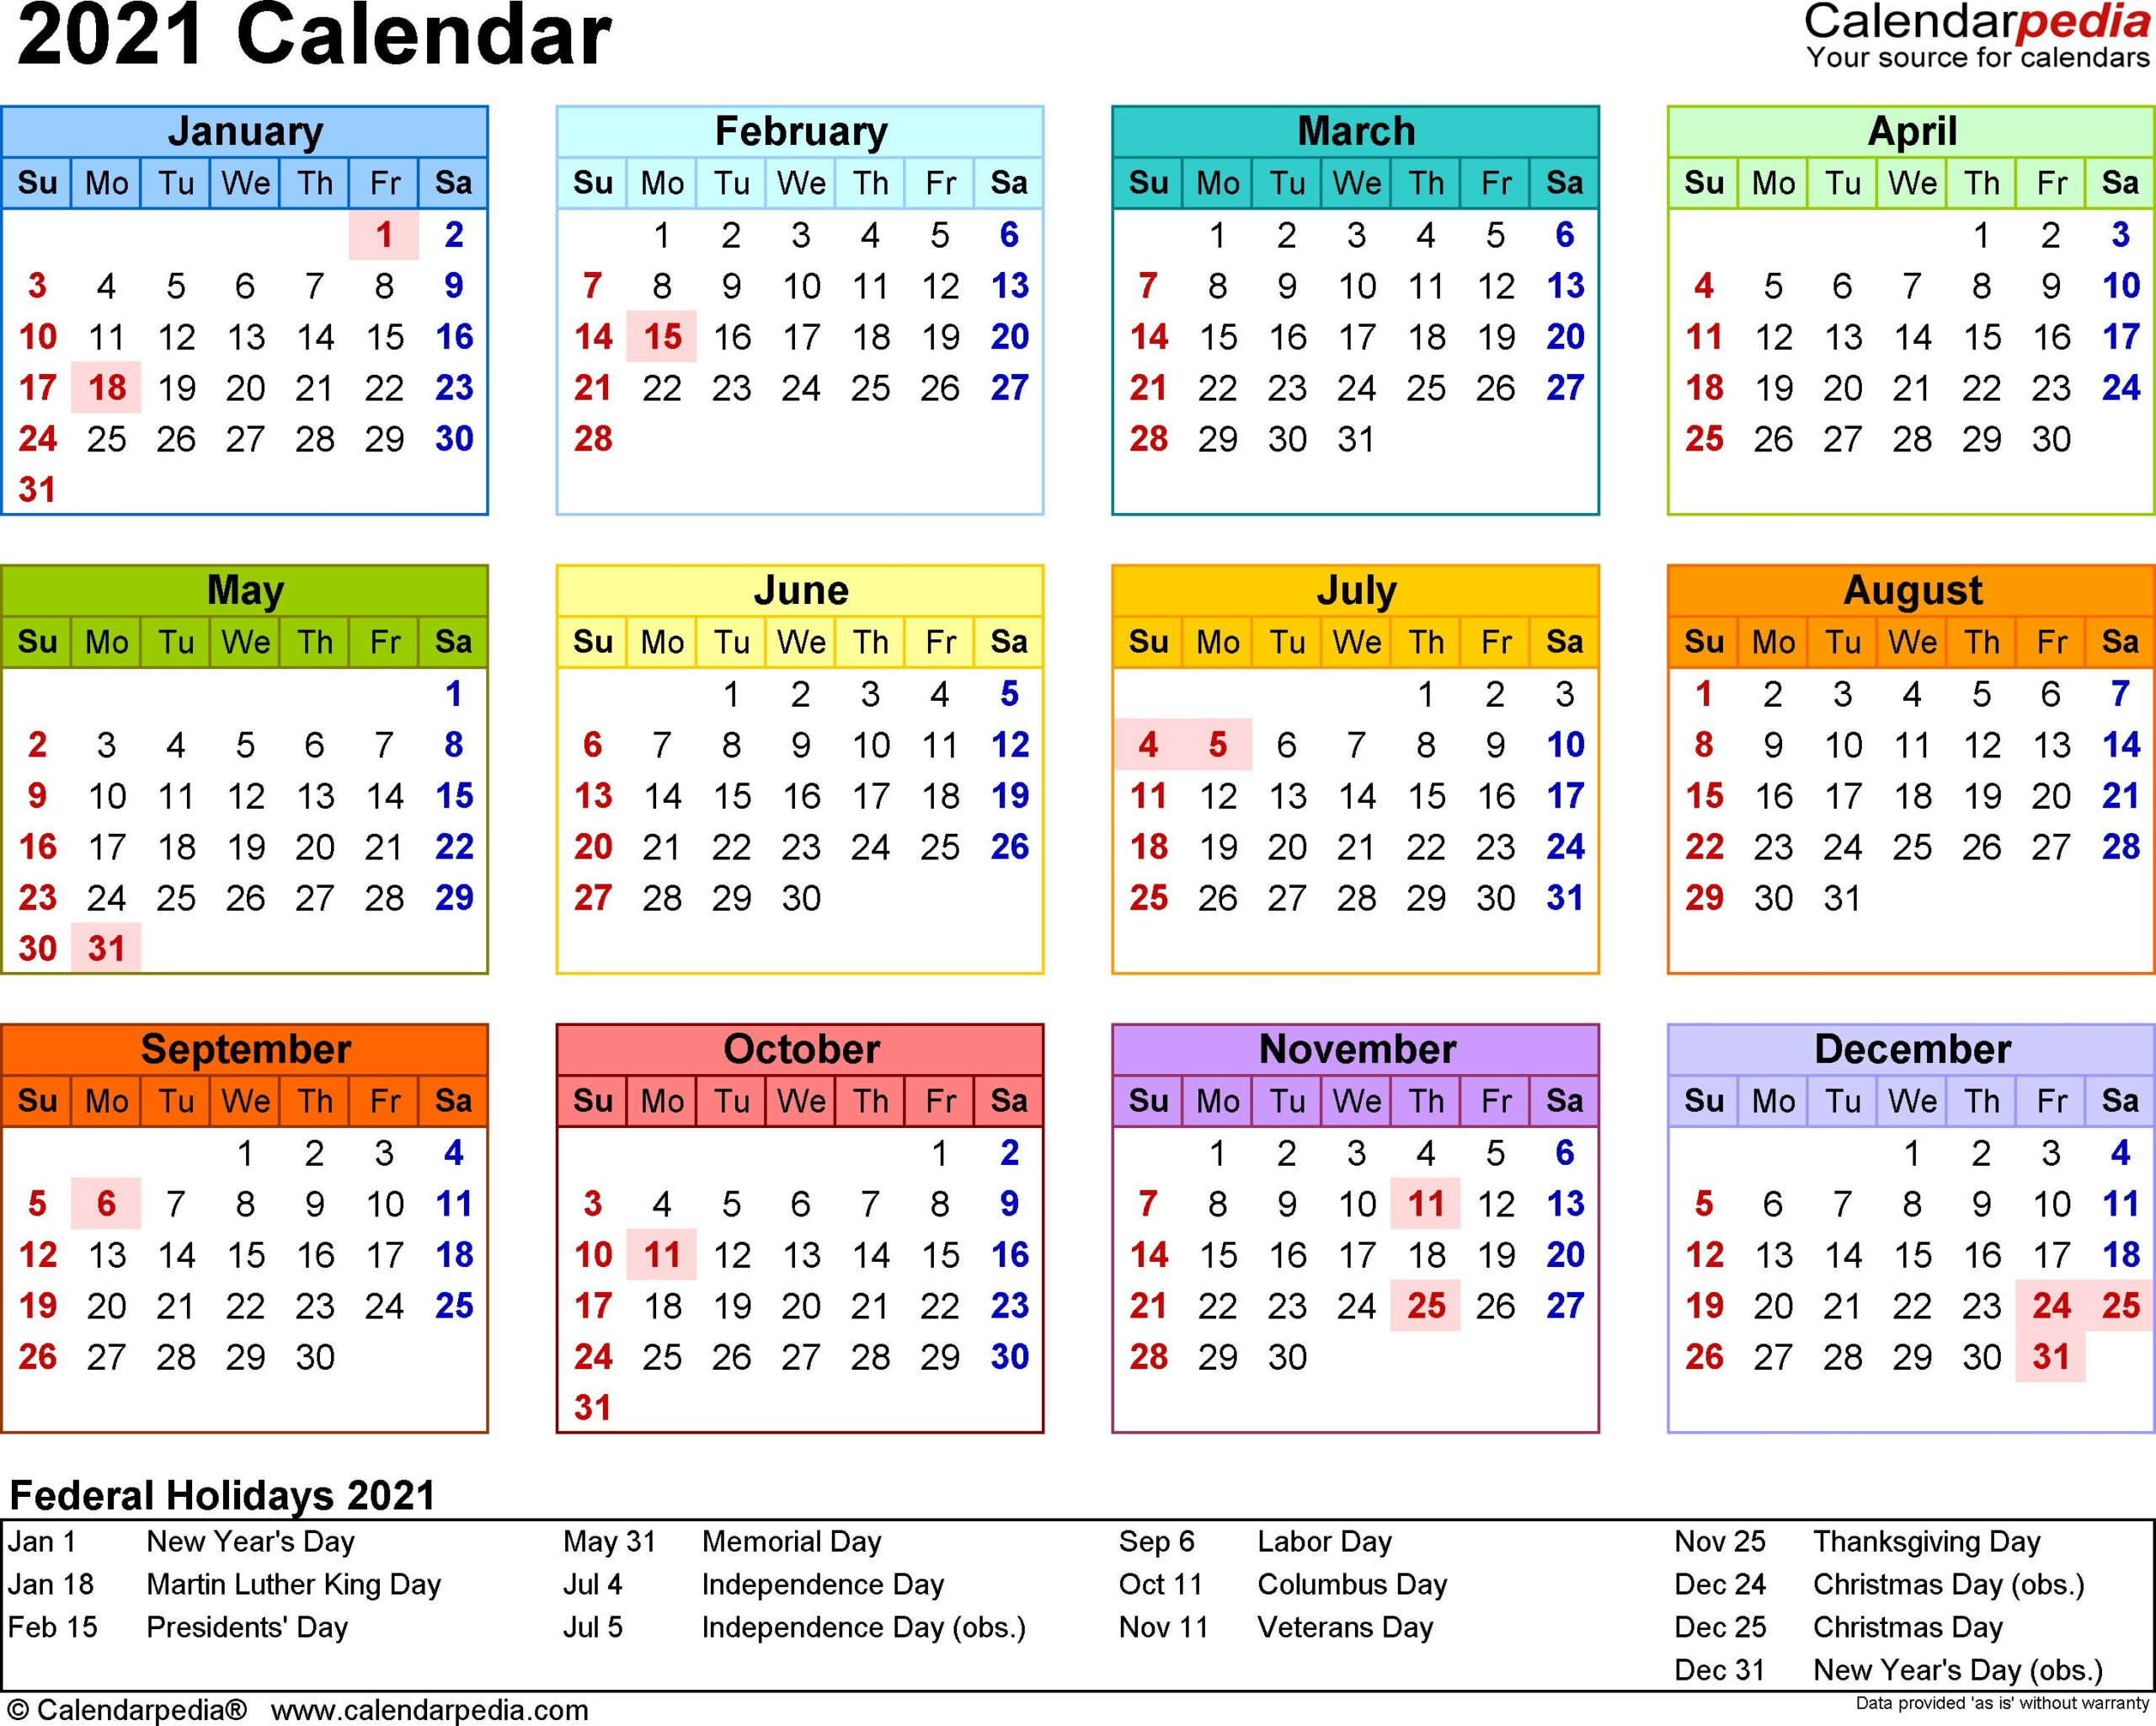 2021 Calendar Template 3 Year Calendar Full Page In 2020